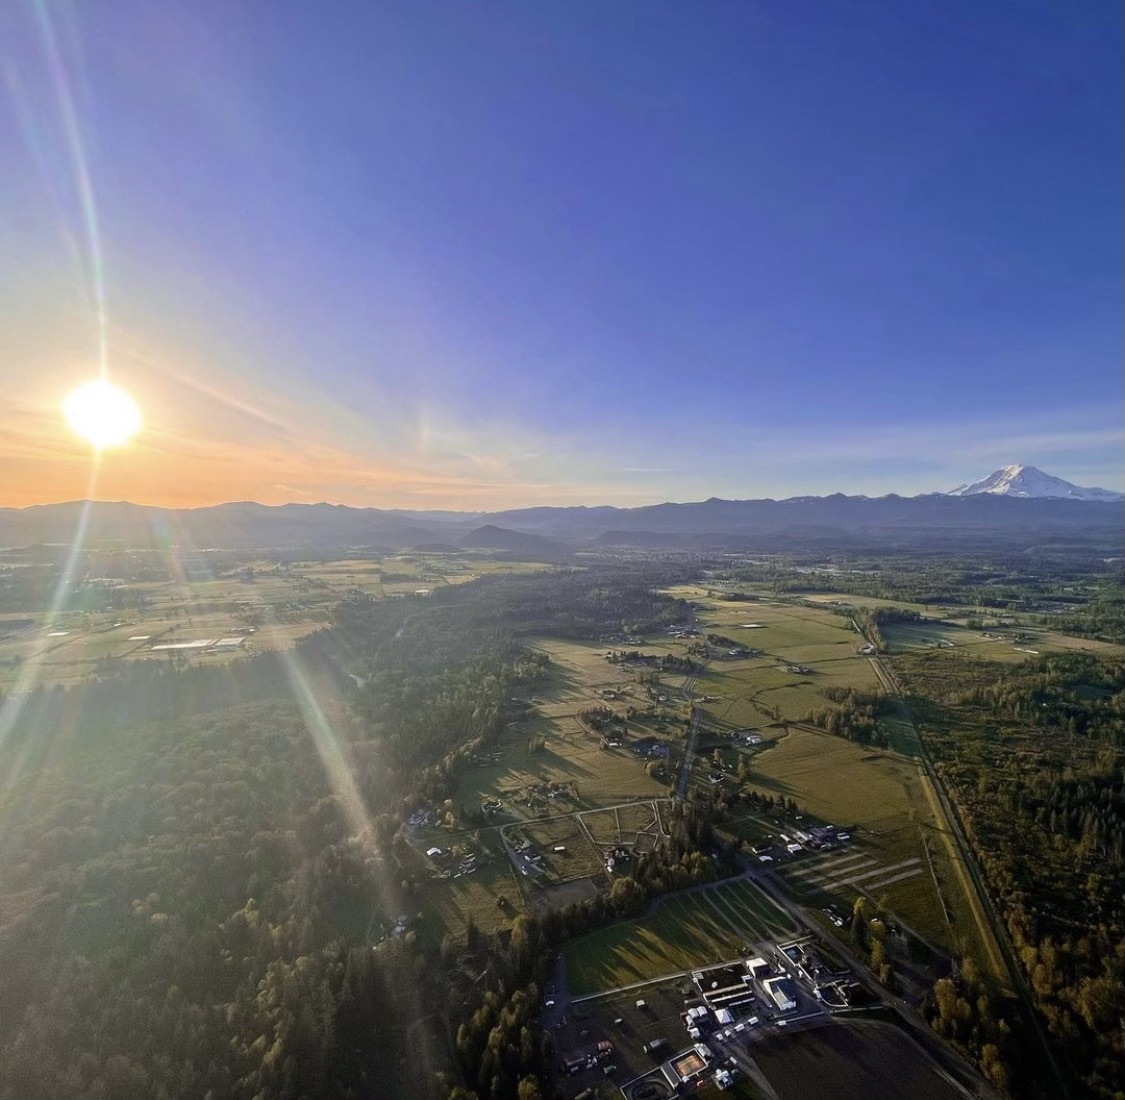 Watching the Sunrise in a hot air balloon kirkland